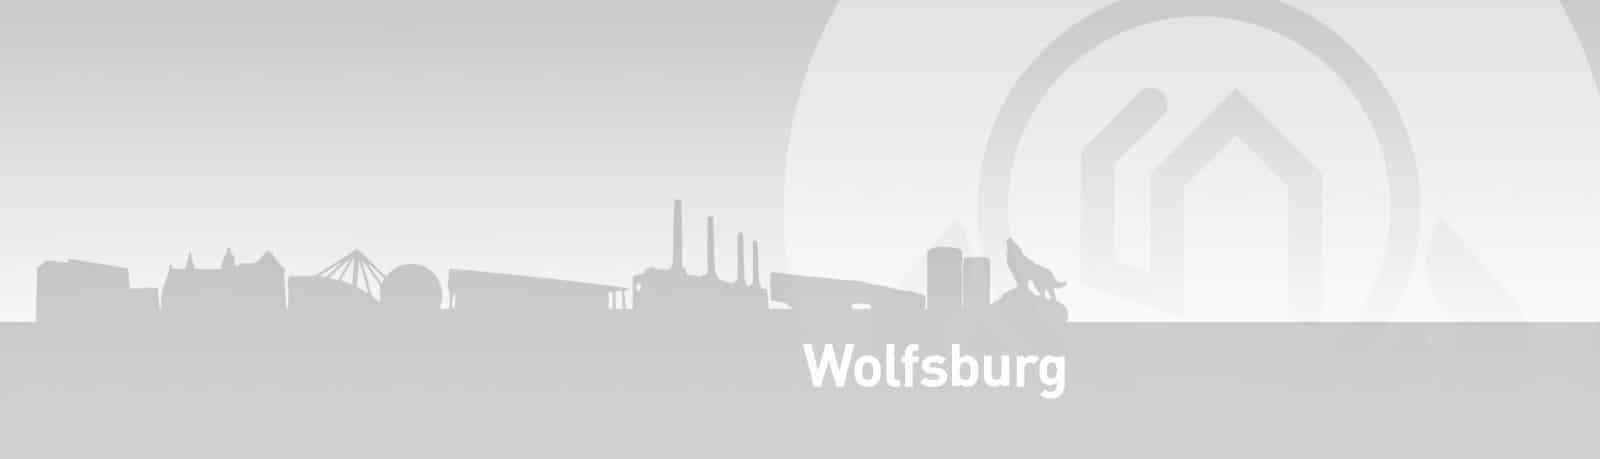 Wolfsburg SENCURINA 1904x546 - Wolfsburg